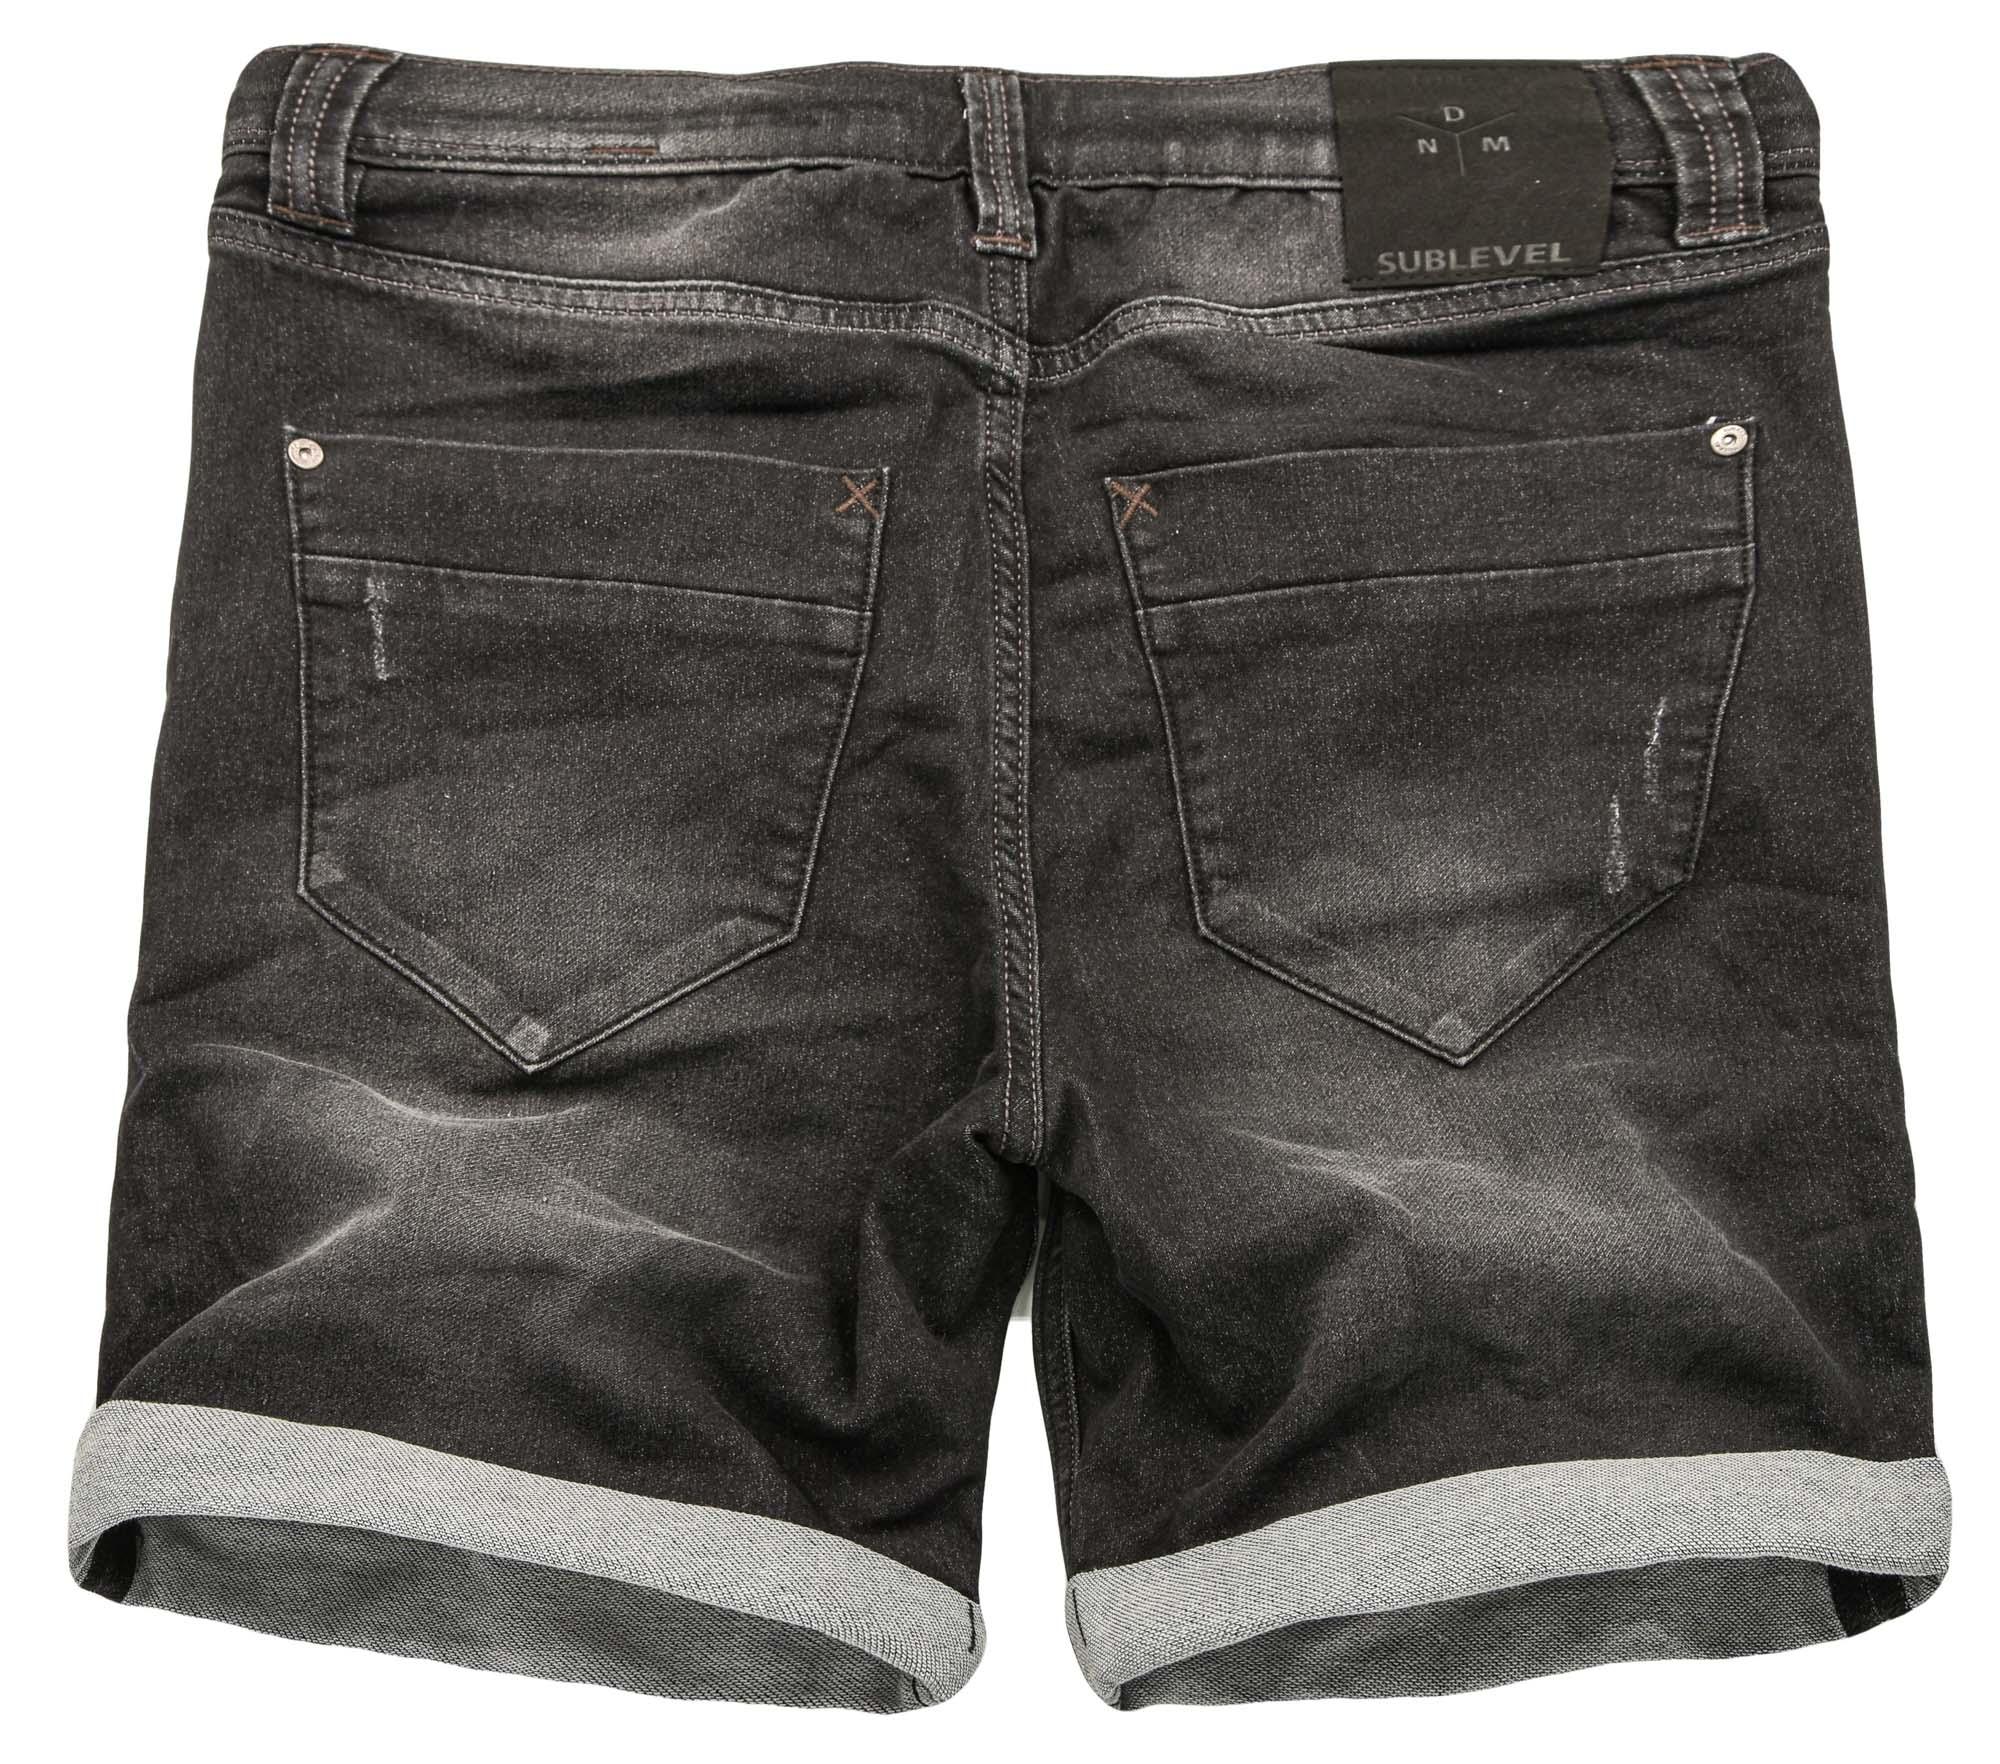 Sublevel-Herren-Sweat-Jeans-Shorts-kurze-Hose-Bermuda-Sommer-Sweathose-Slim-NEU Indexbild 3